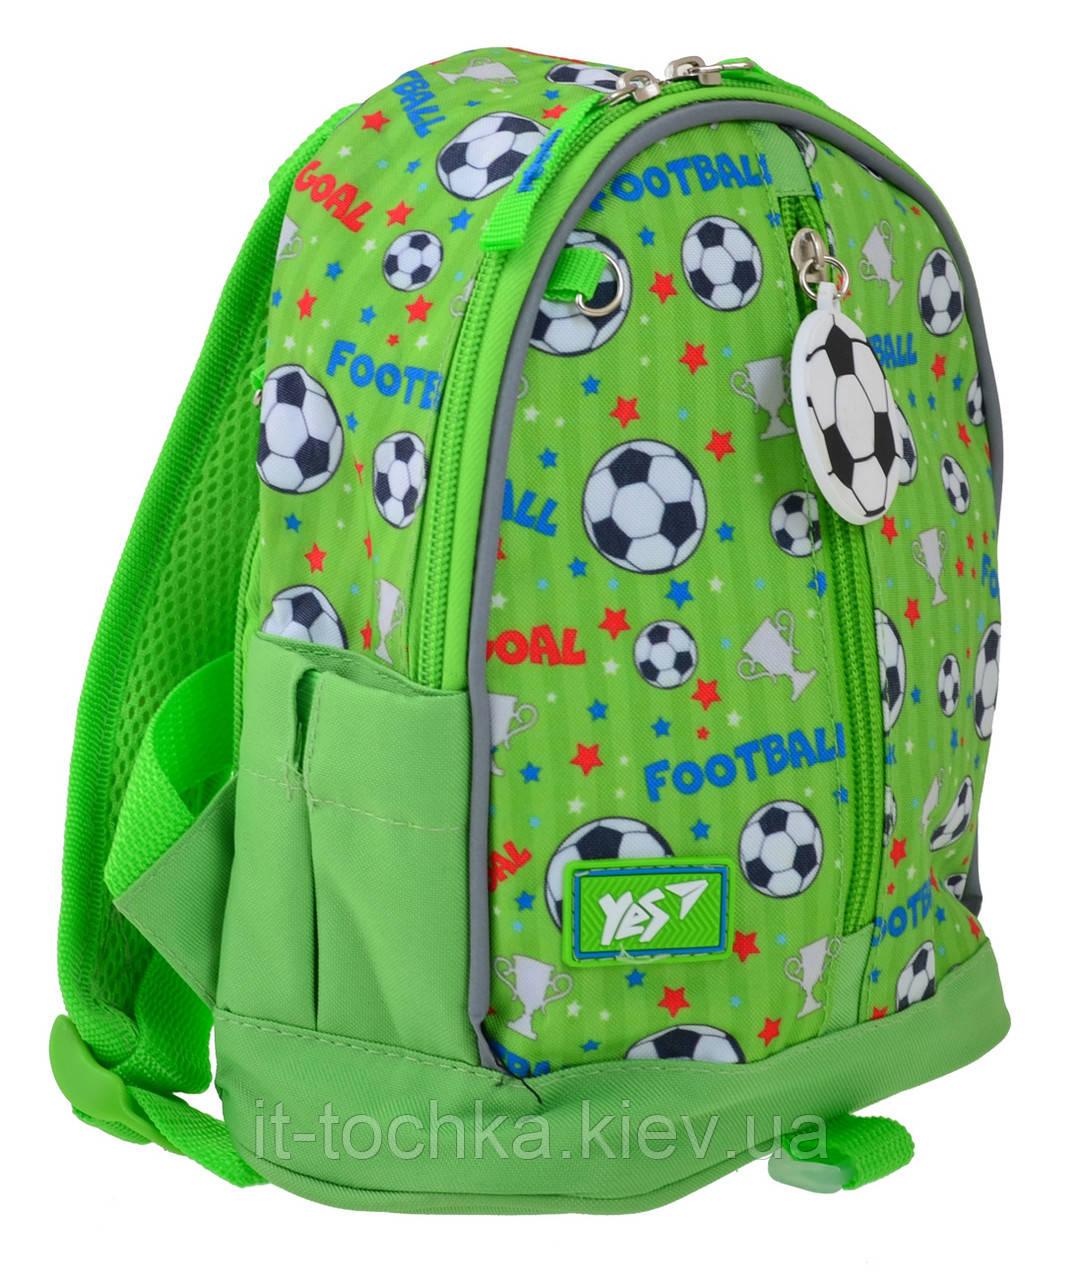 Рюкзак детский  yes  k-30 match yes 556895